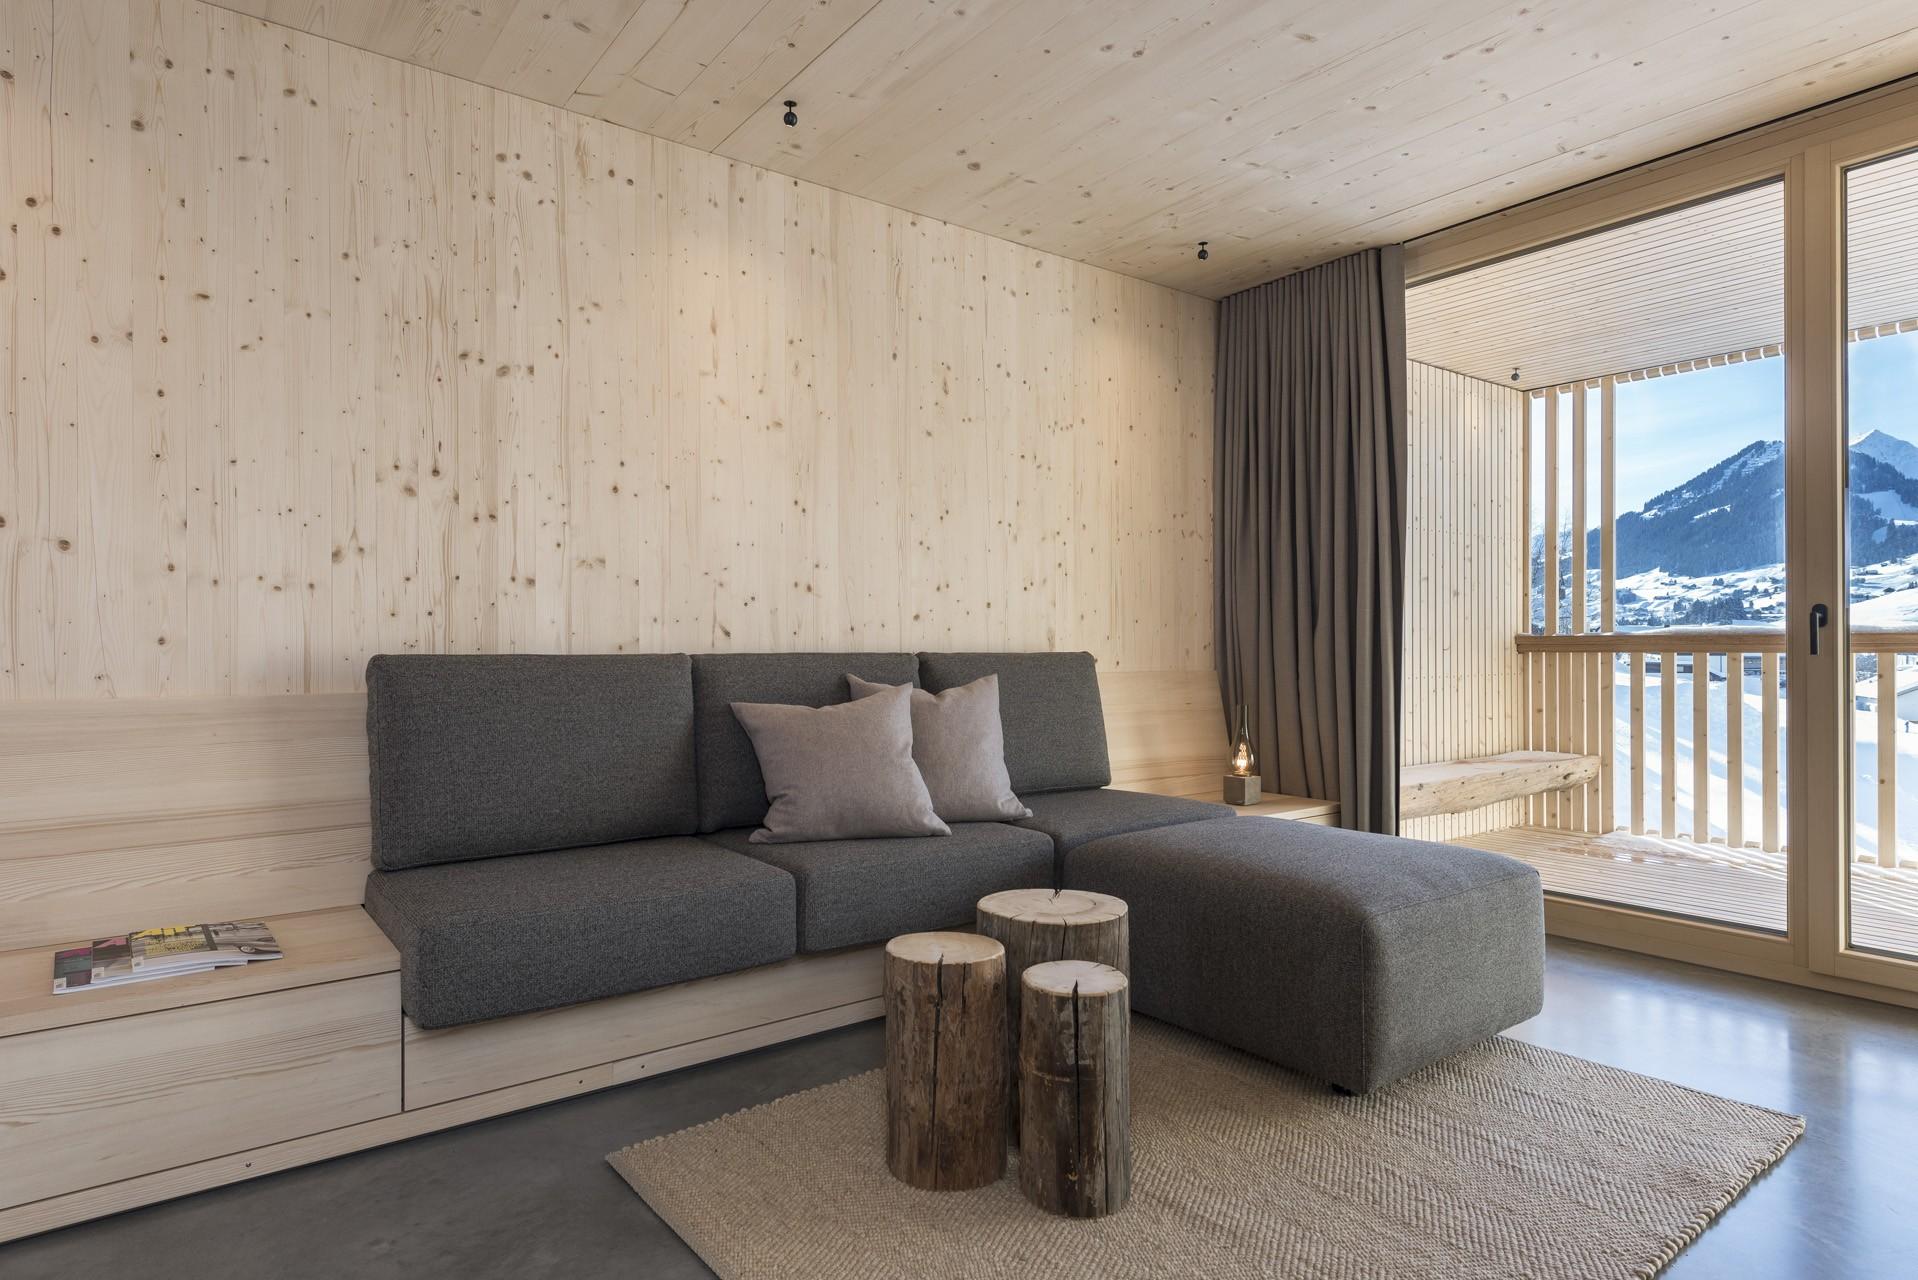 architektur-raum-oswalda-hus-12